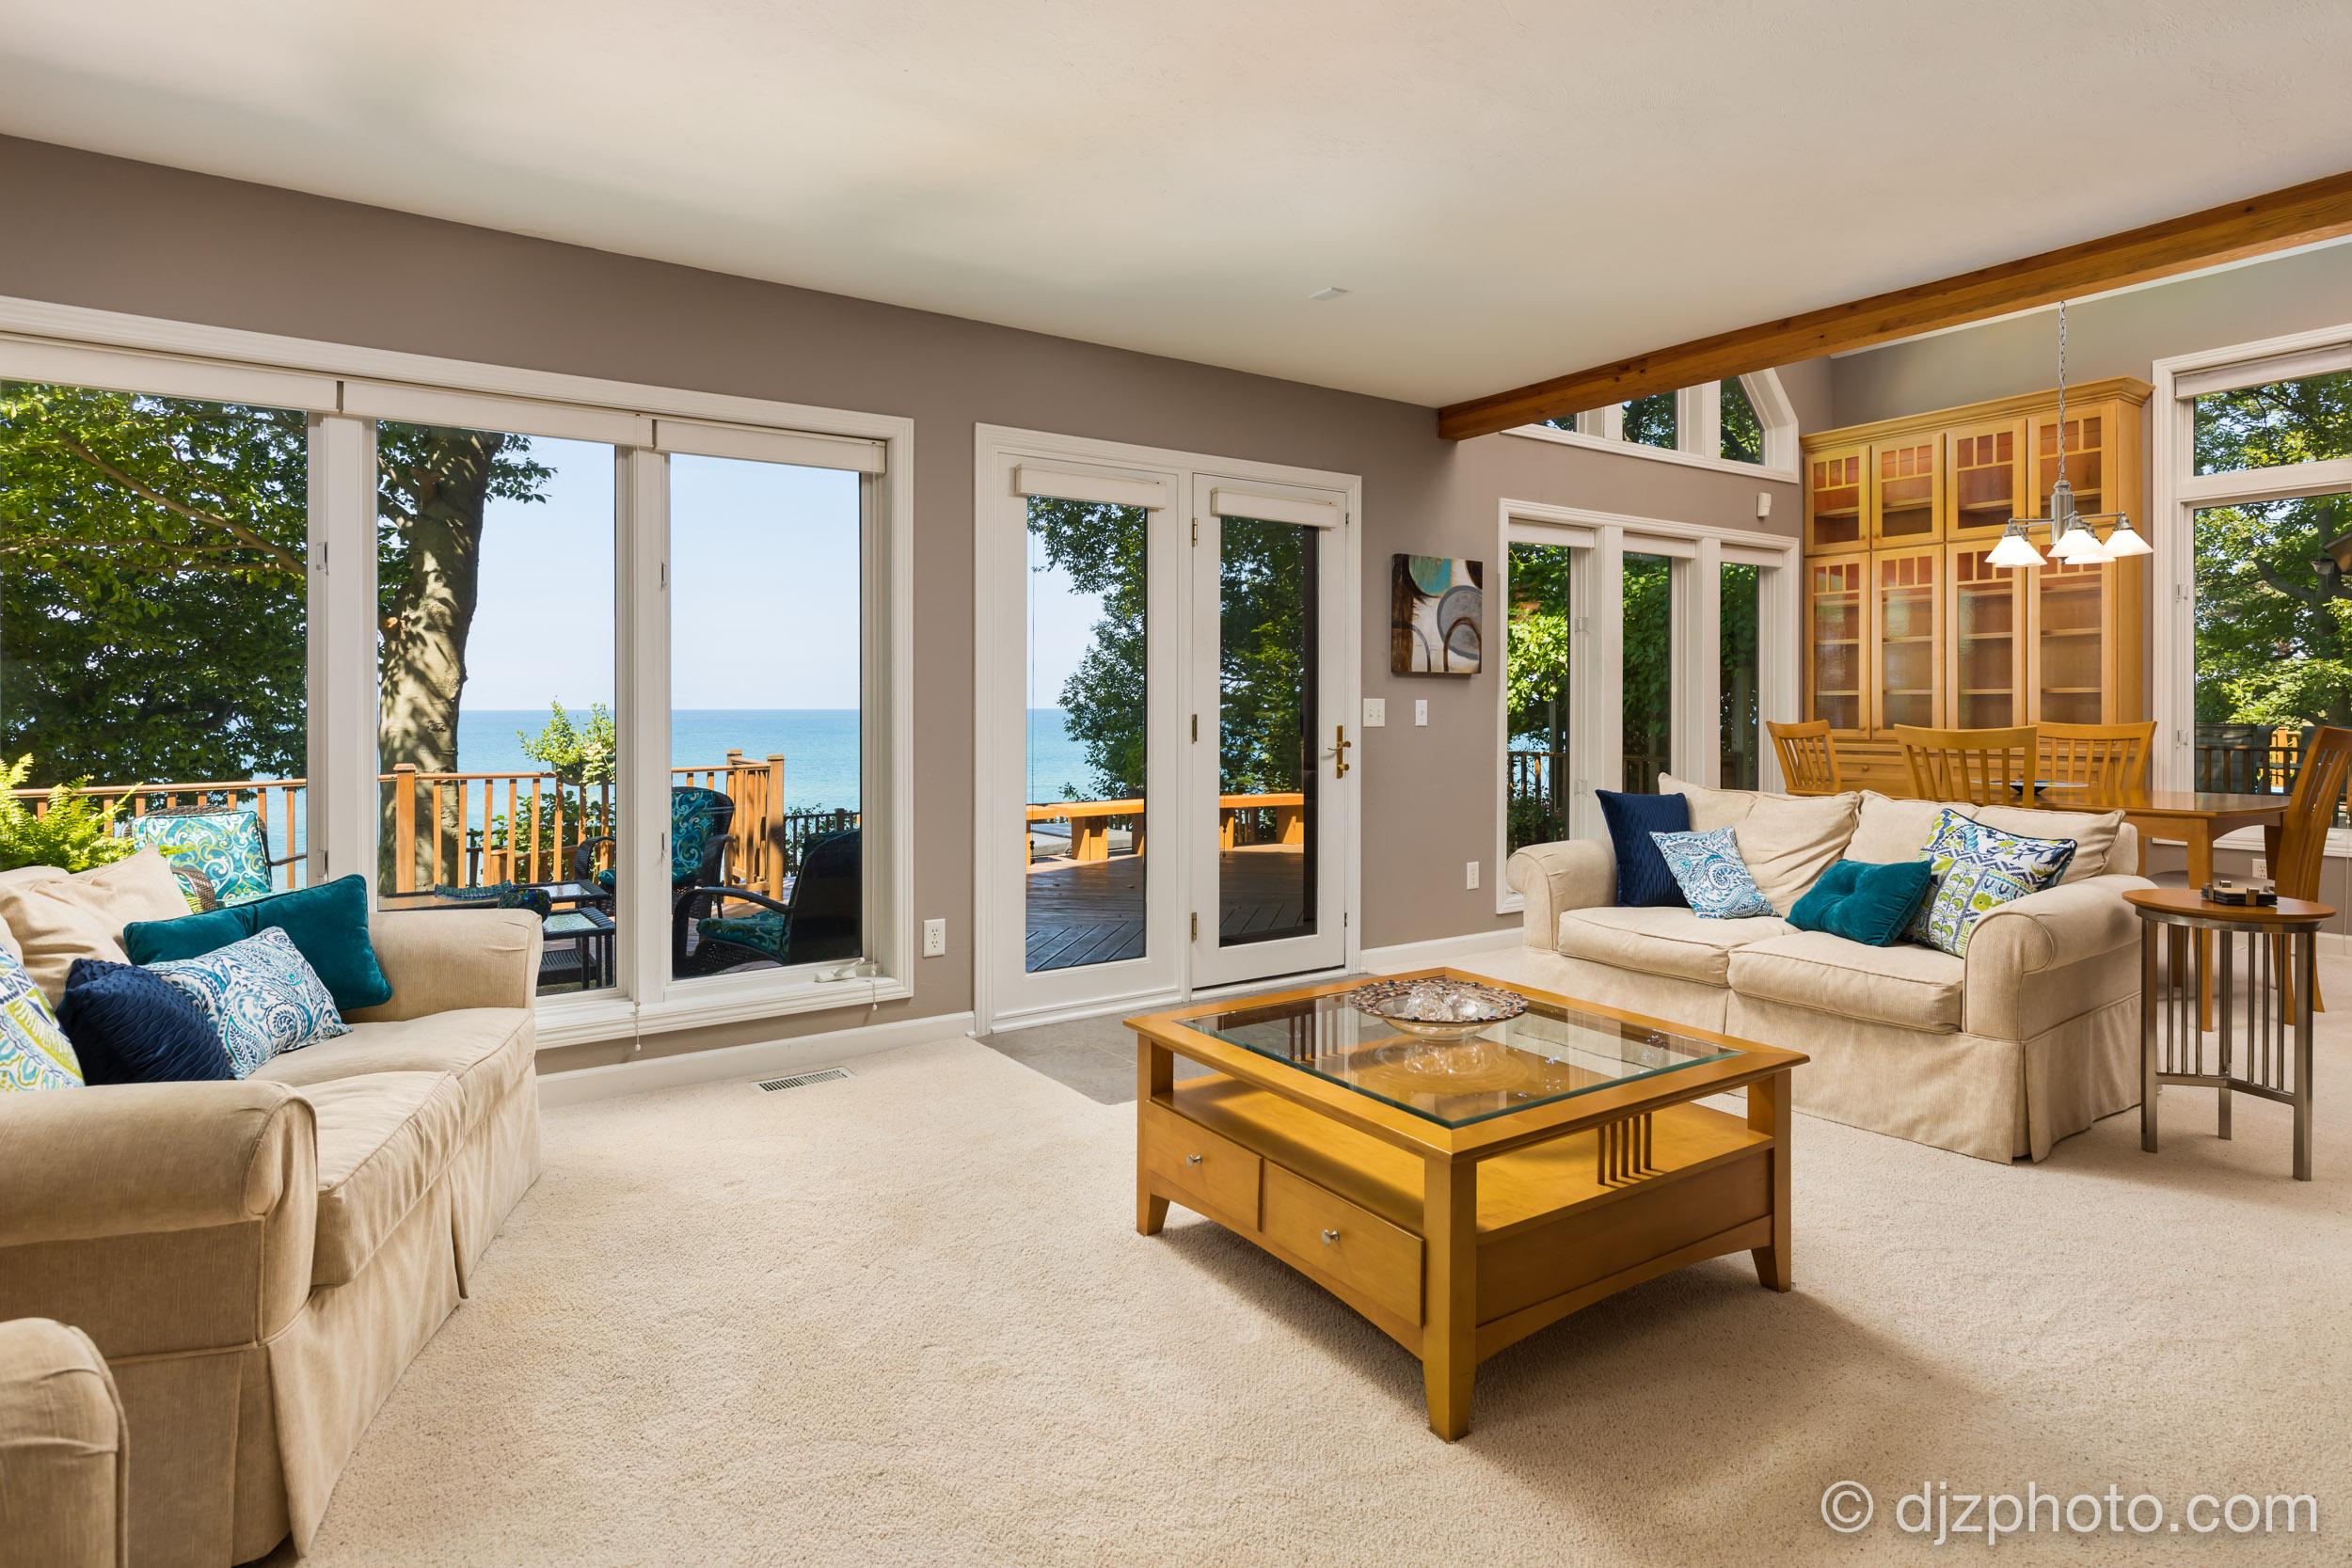 Living Room with Lake Michigan Views